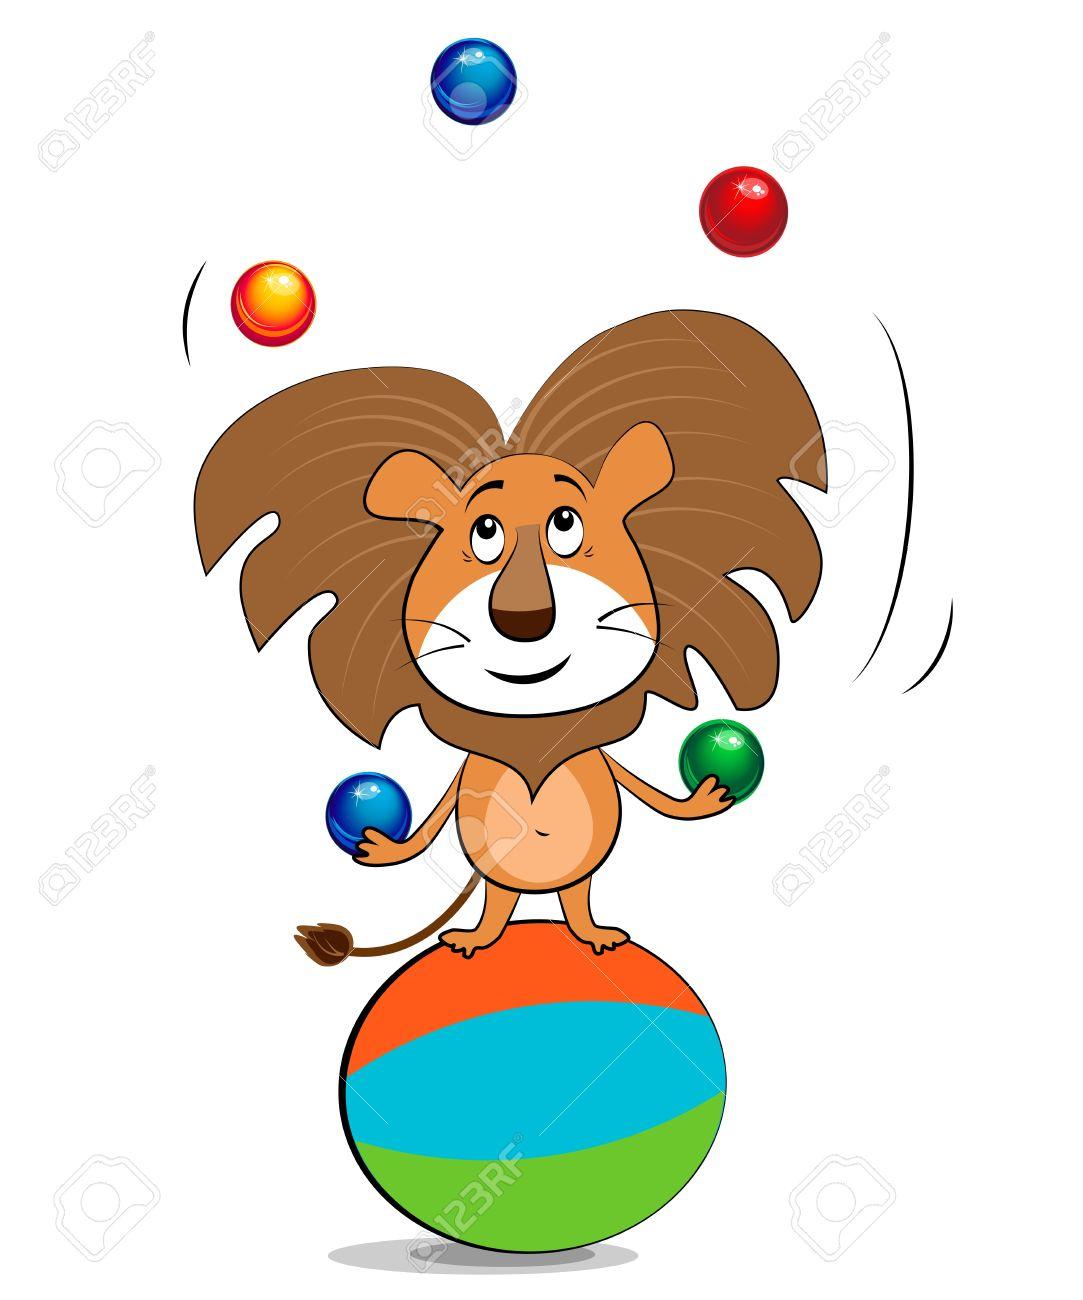 Lion Juggling Balls Royalty Free Cliparts, Vectors, And Stock.